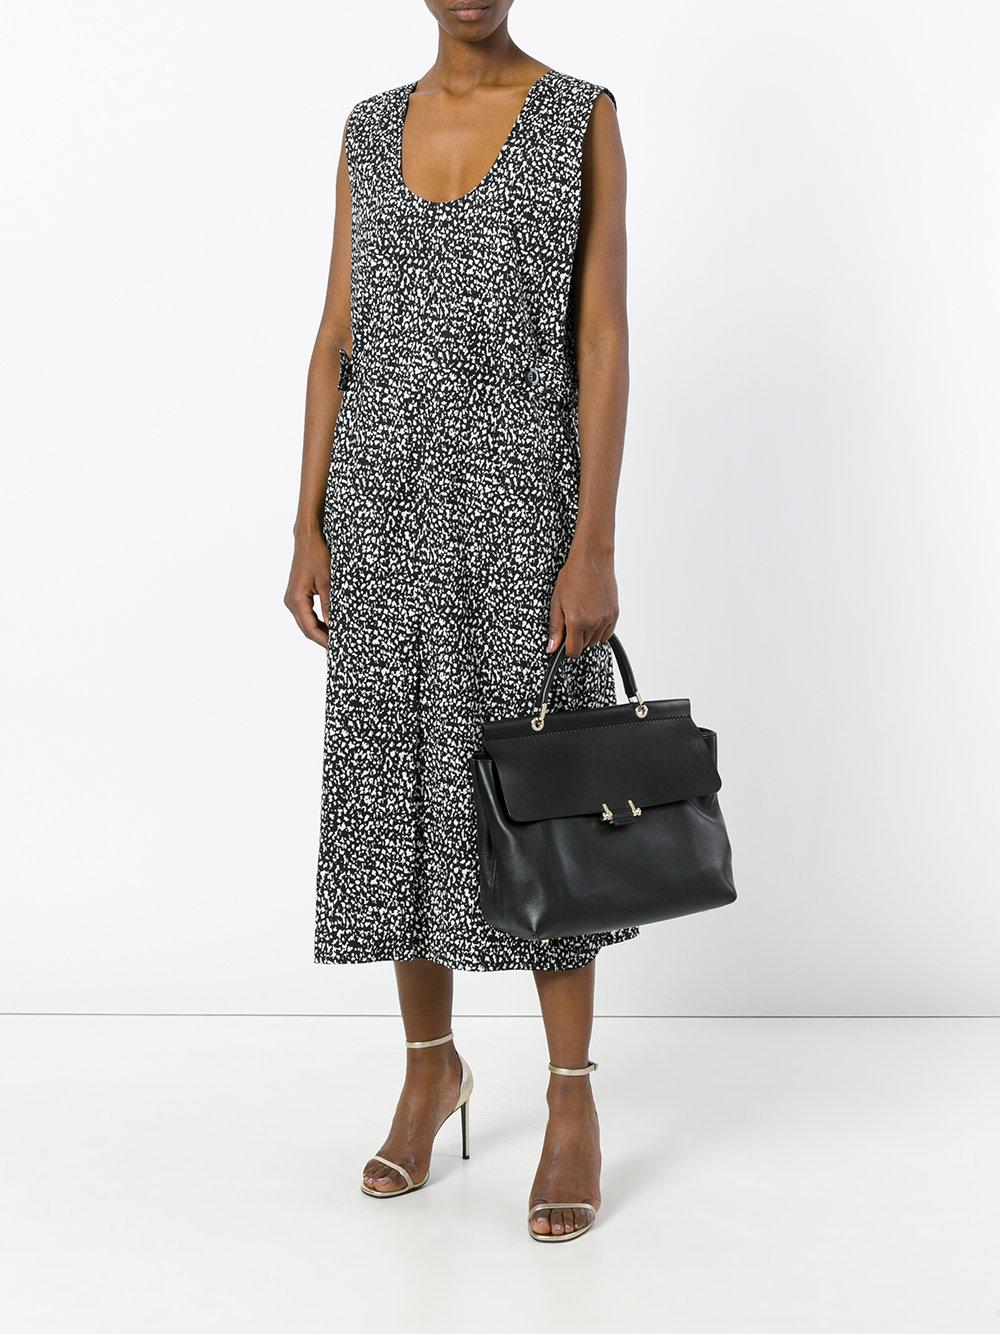 lanvin-Black-Medium-Essential-Tote-Bag Best Bags to Buy This Year - Top 20 Designer Bags of 2020